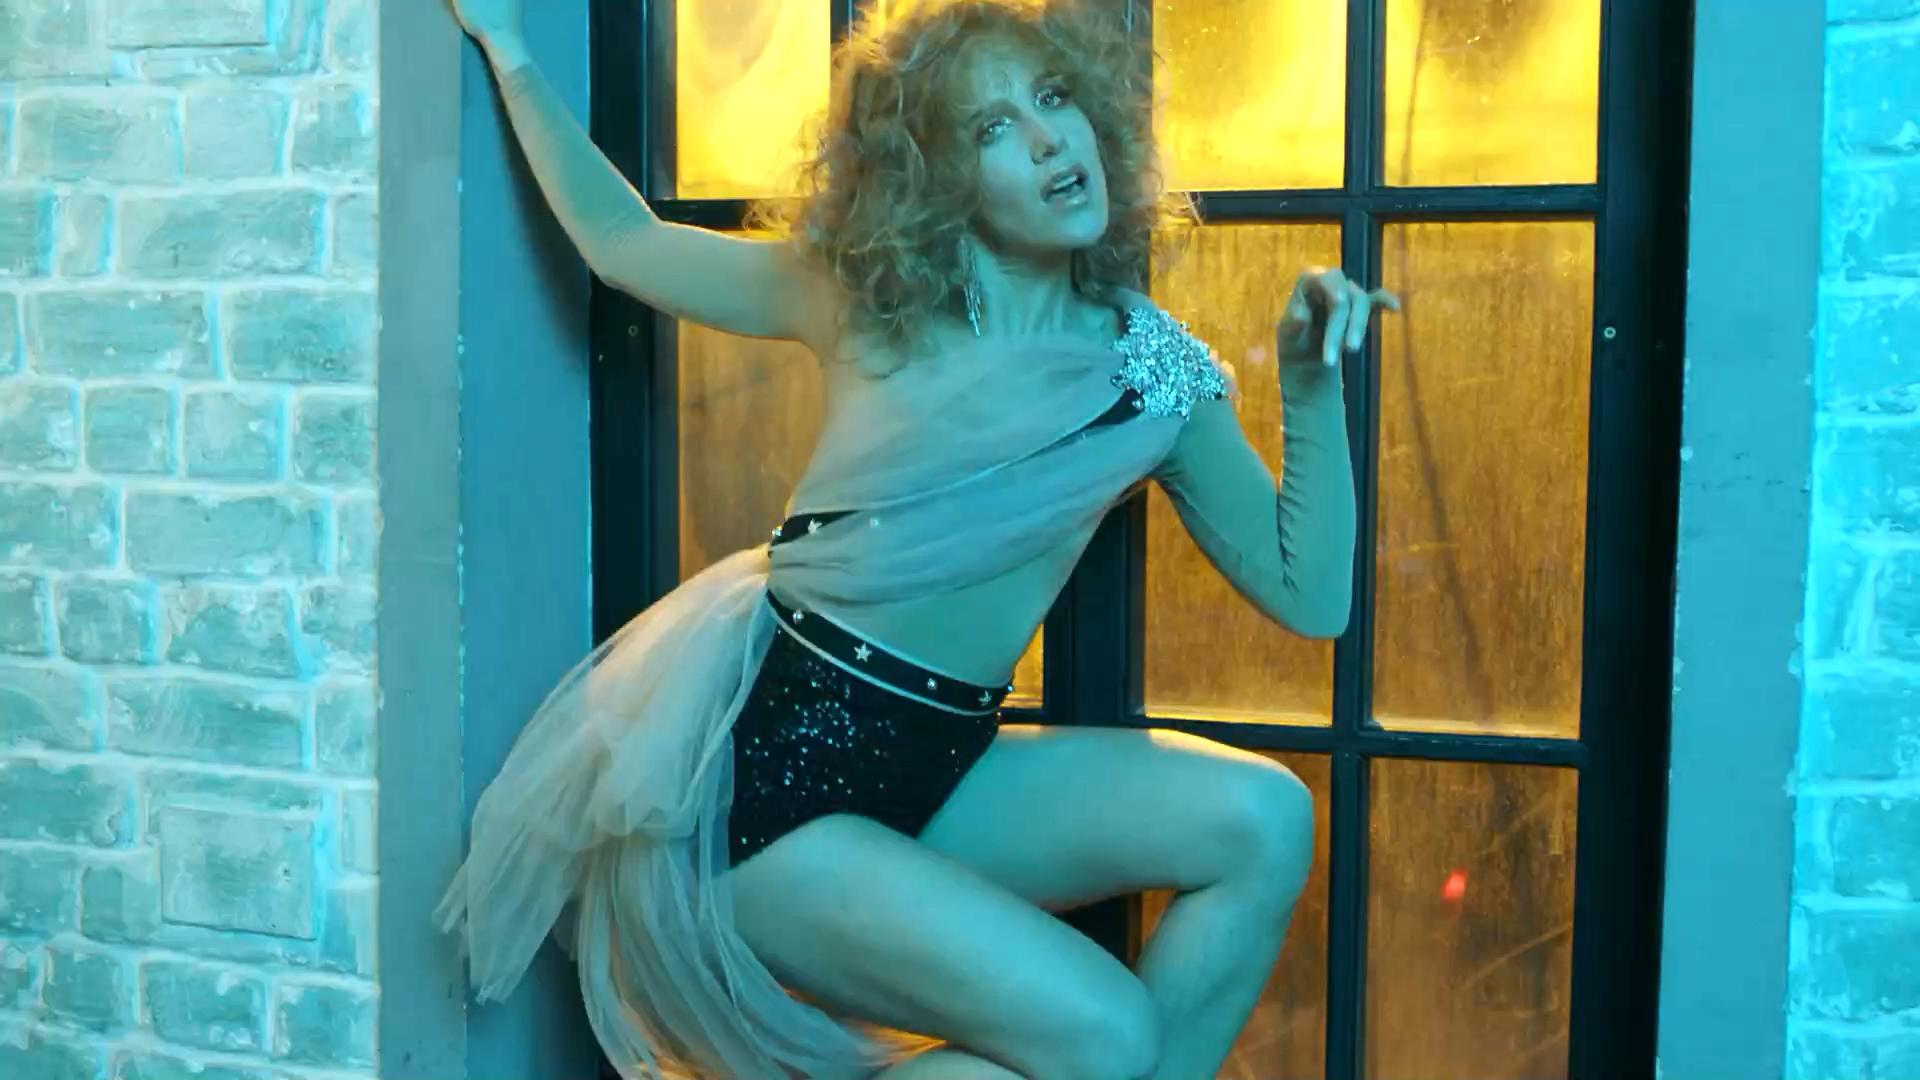 Юлия Ковальчук - Давай (2019/Full HD)